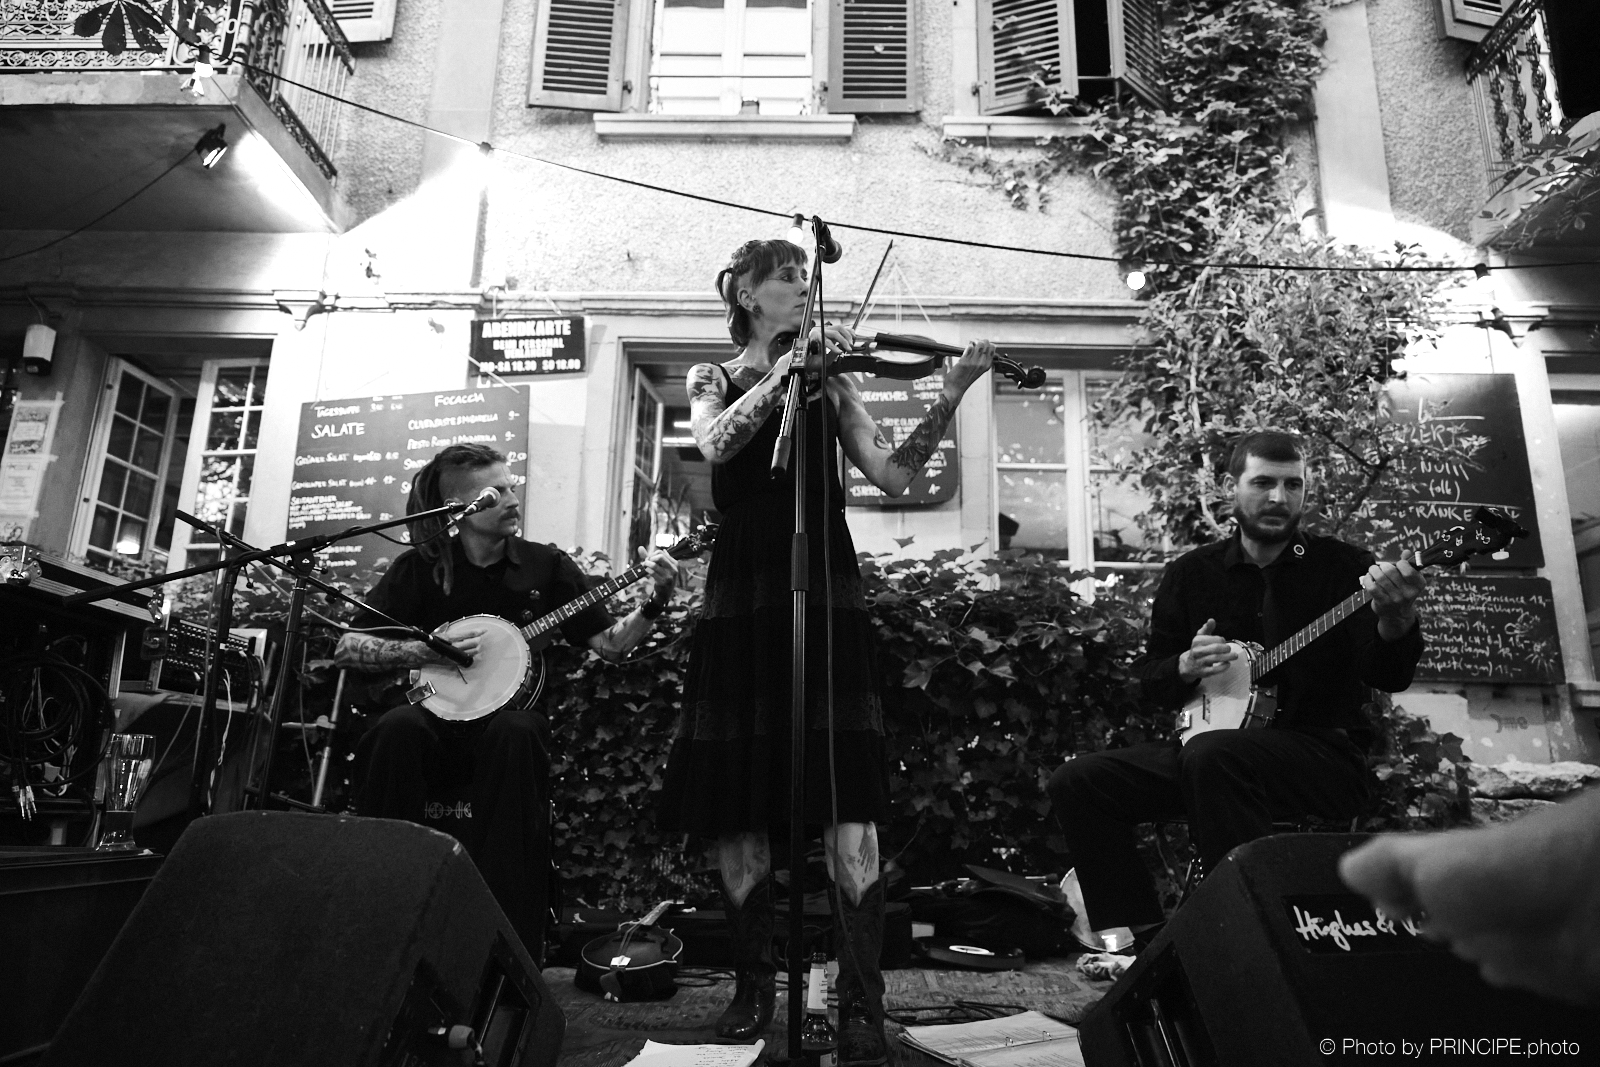 Pin Noir @ Brasserie Lorraine